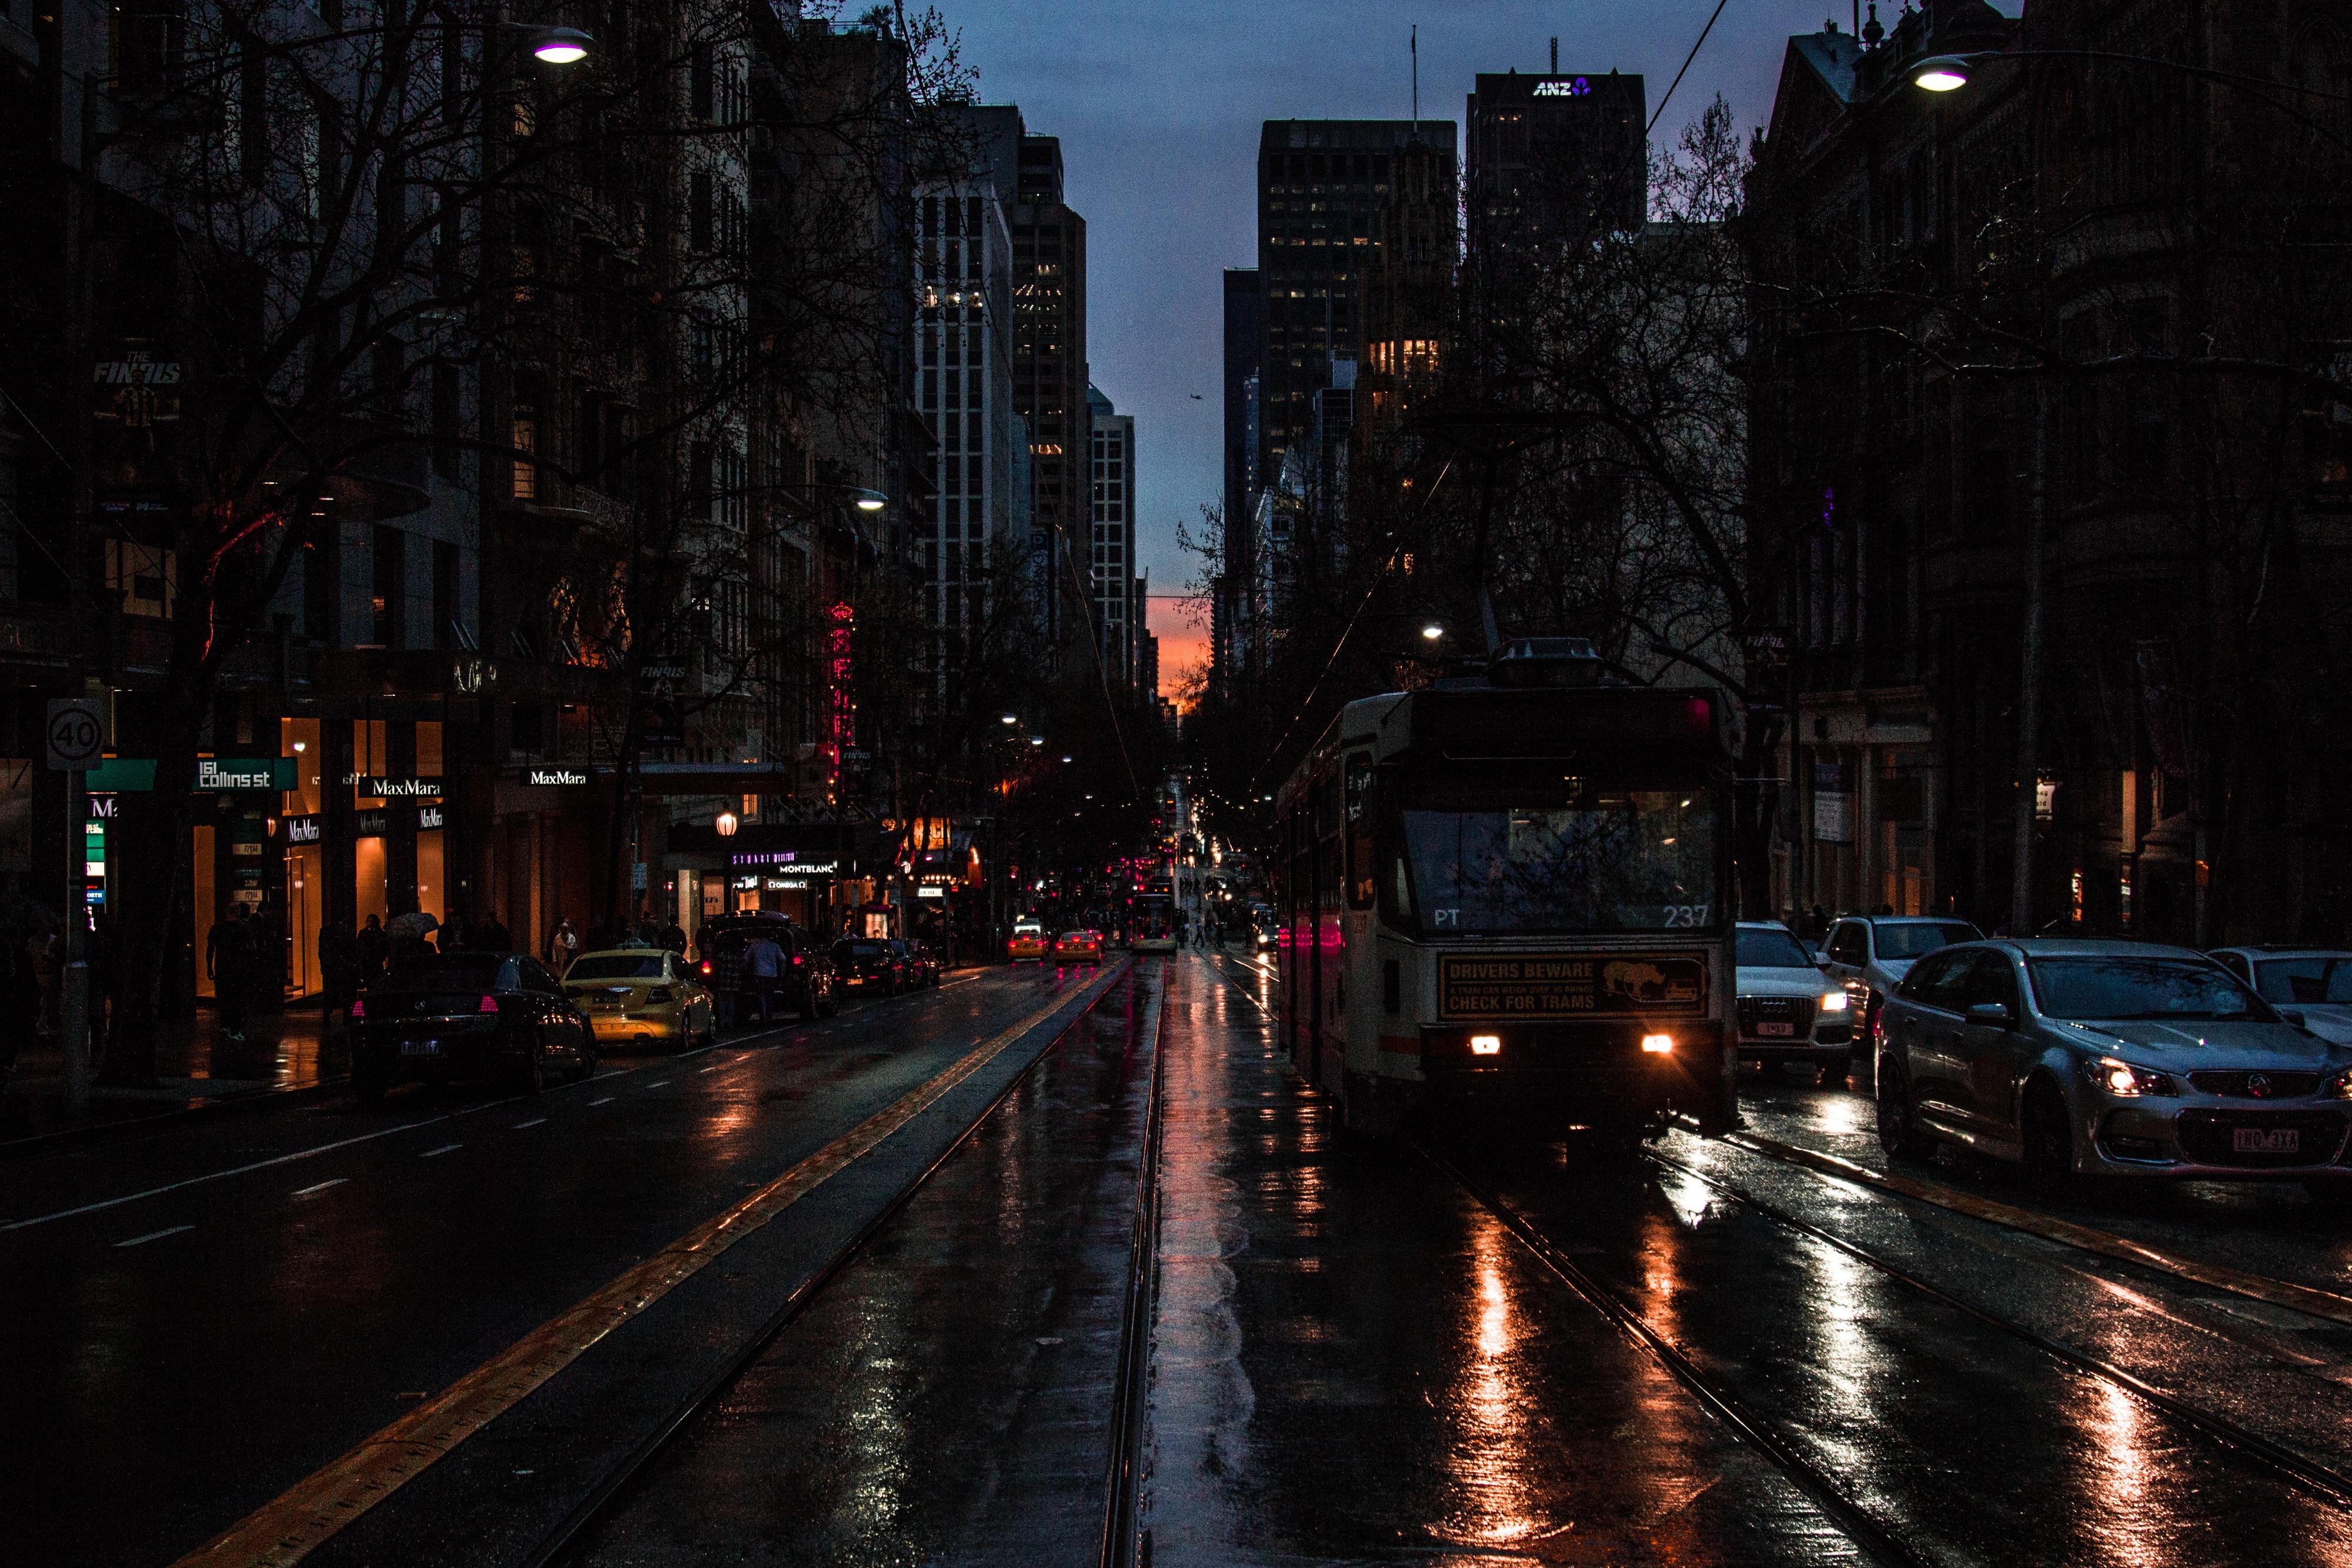 картинки улица города ночью успеху